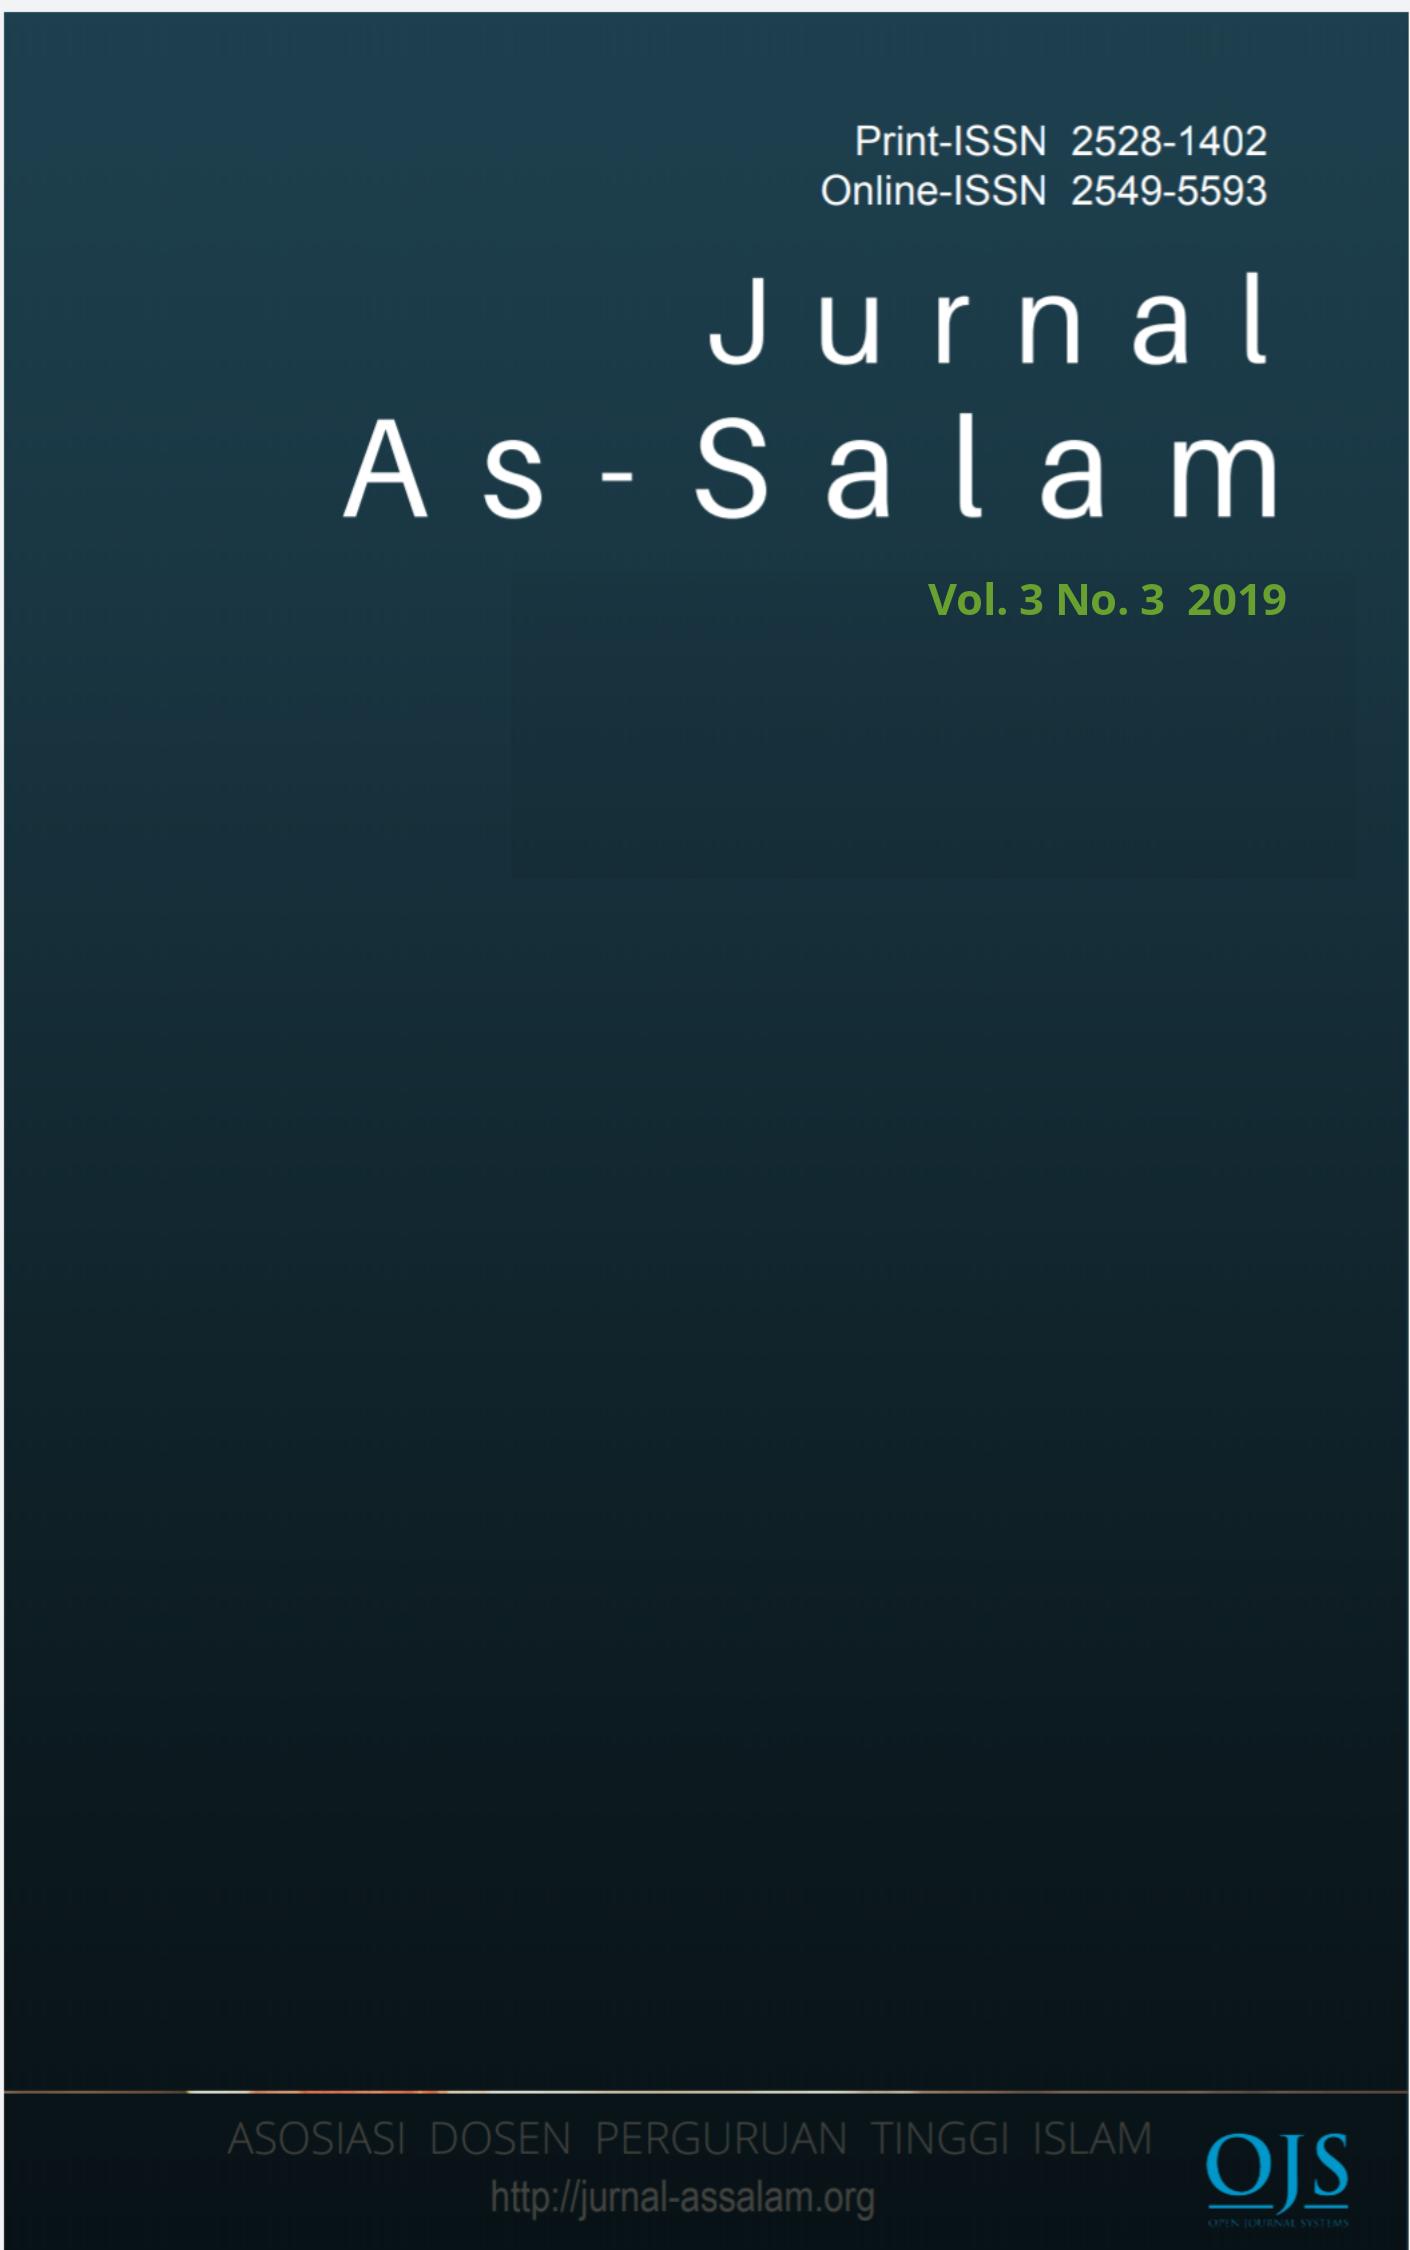 View Vol. 3 No. 3 (2019): Jurnal As-Salam